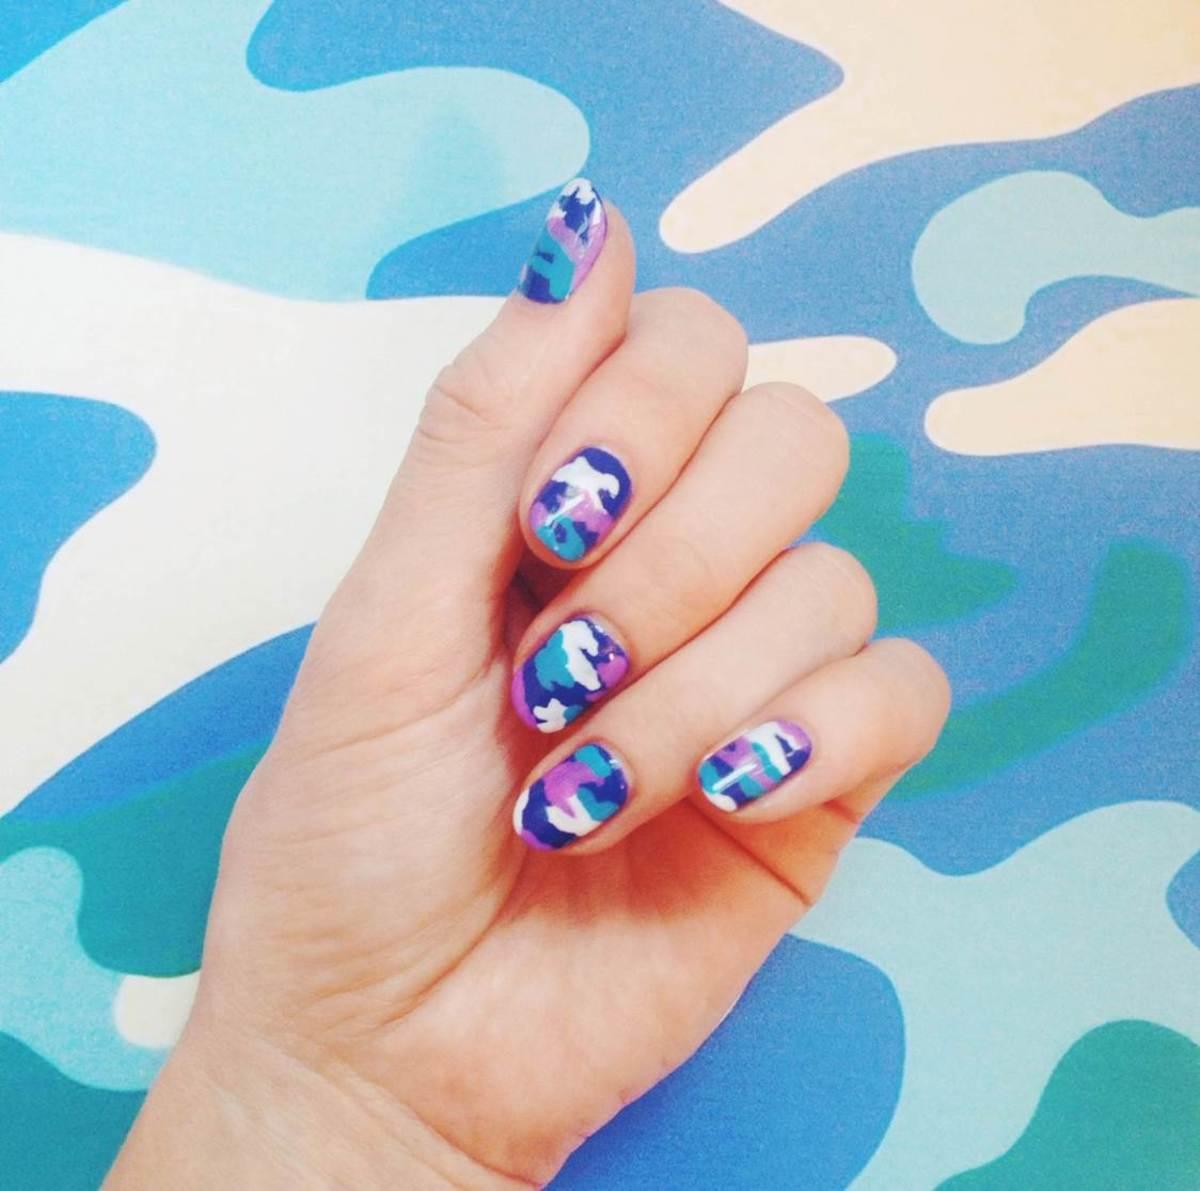 Madeline Poole blue camouflage nails